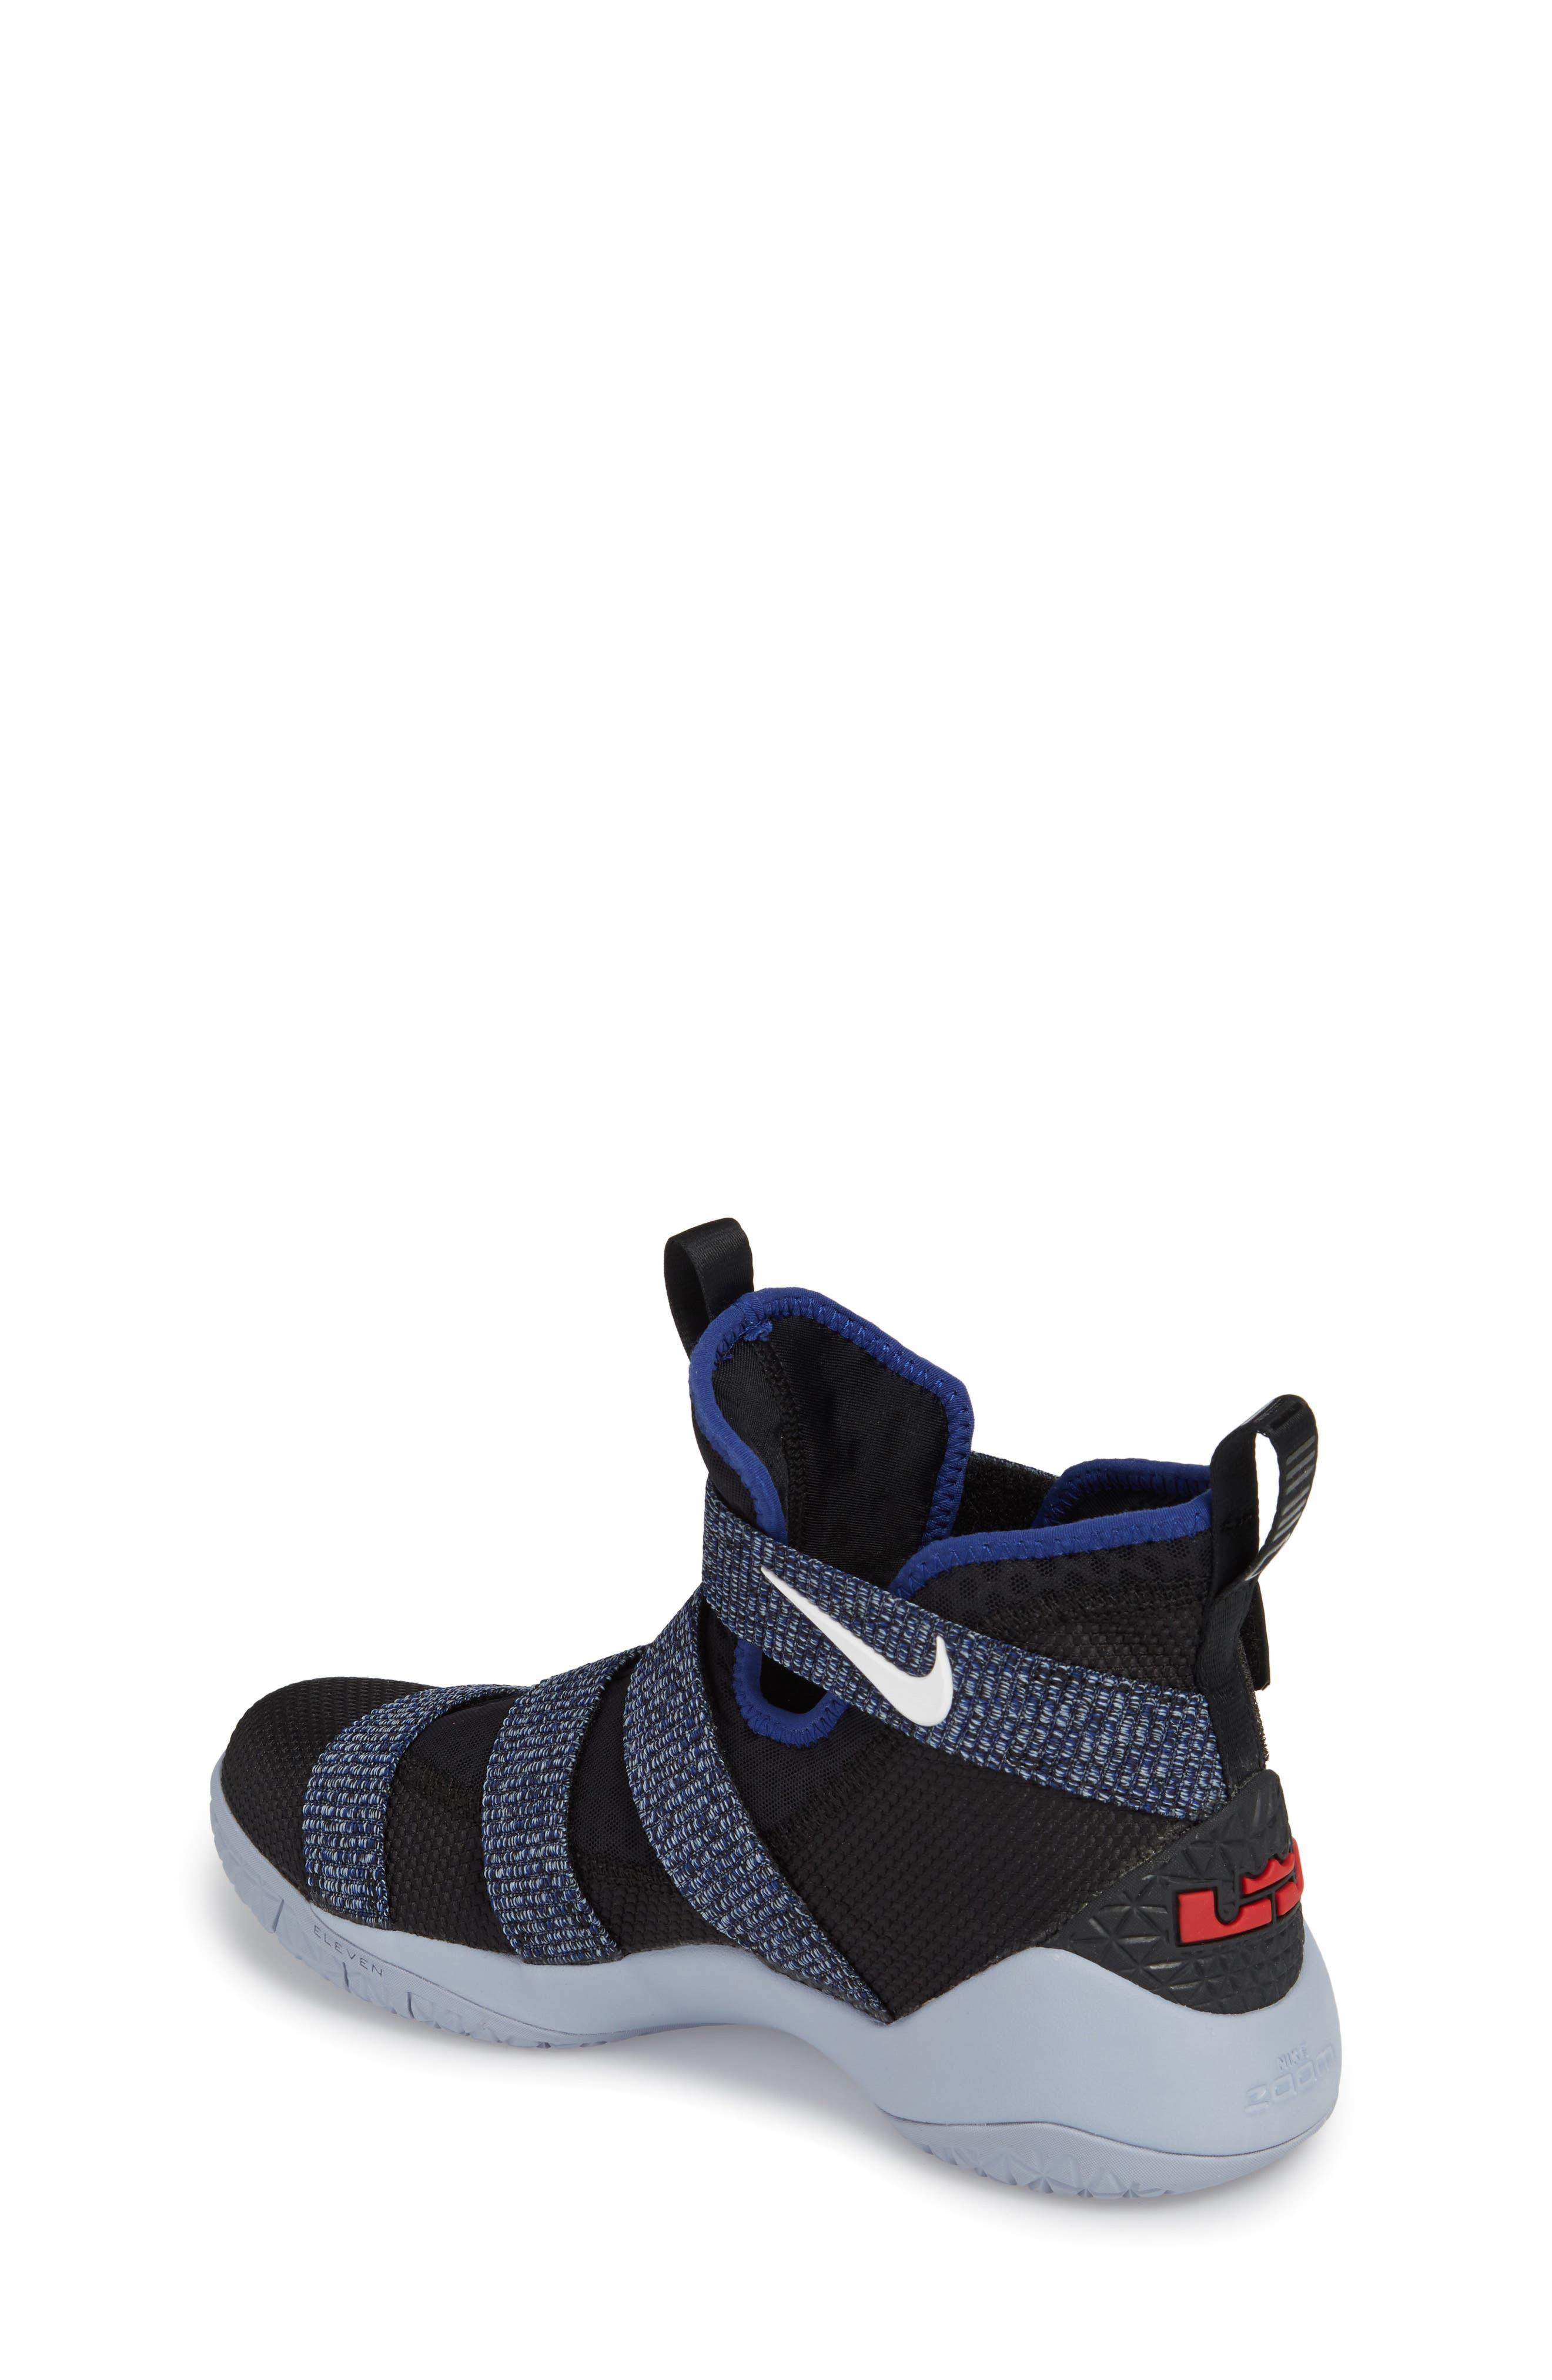 LeBron Soldier XI Basketball Shoe,                             Alternate thumbnail 2, color,                             005